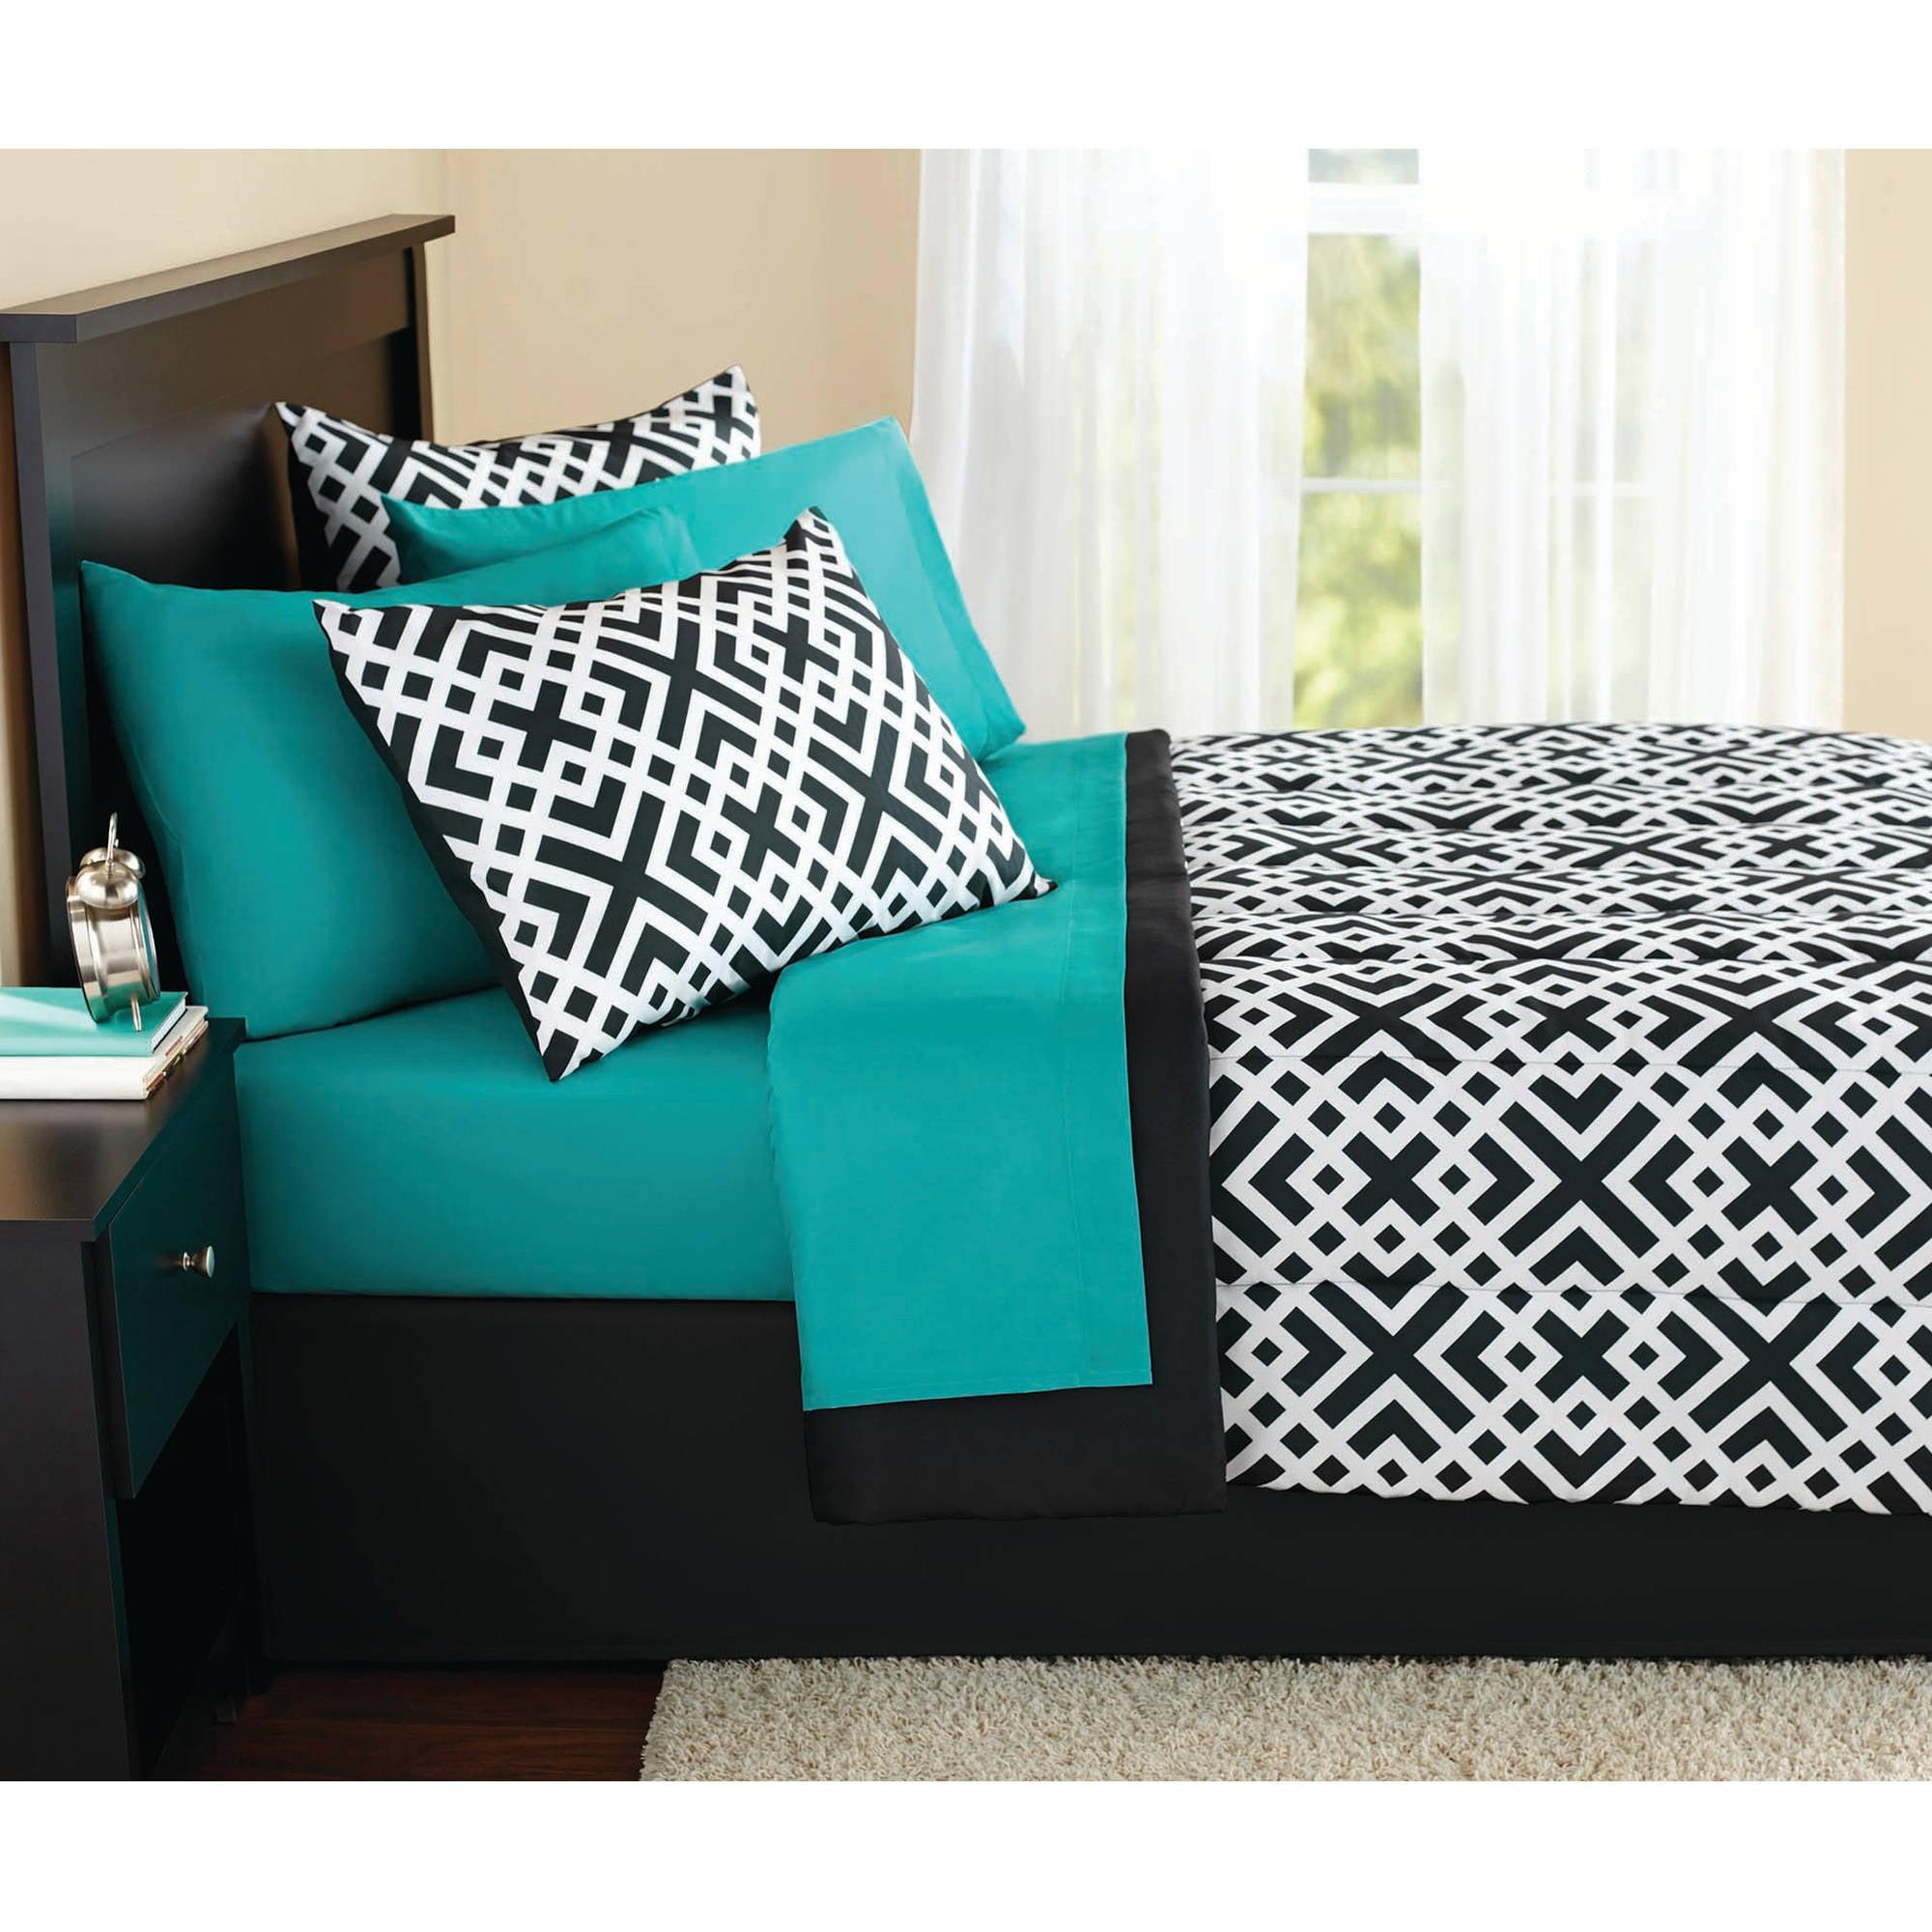 Mainstays Interlocking Geo Bed in a Bag Coordinated Bedding